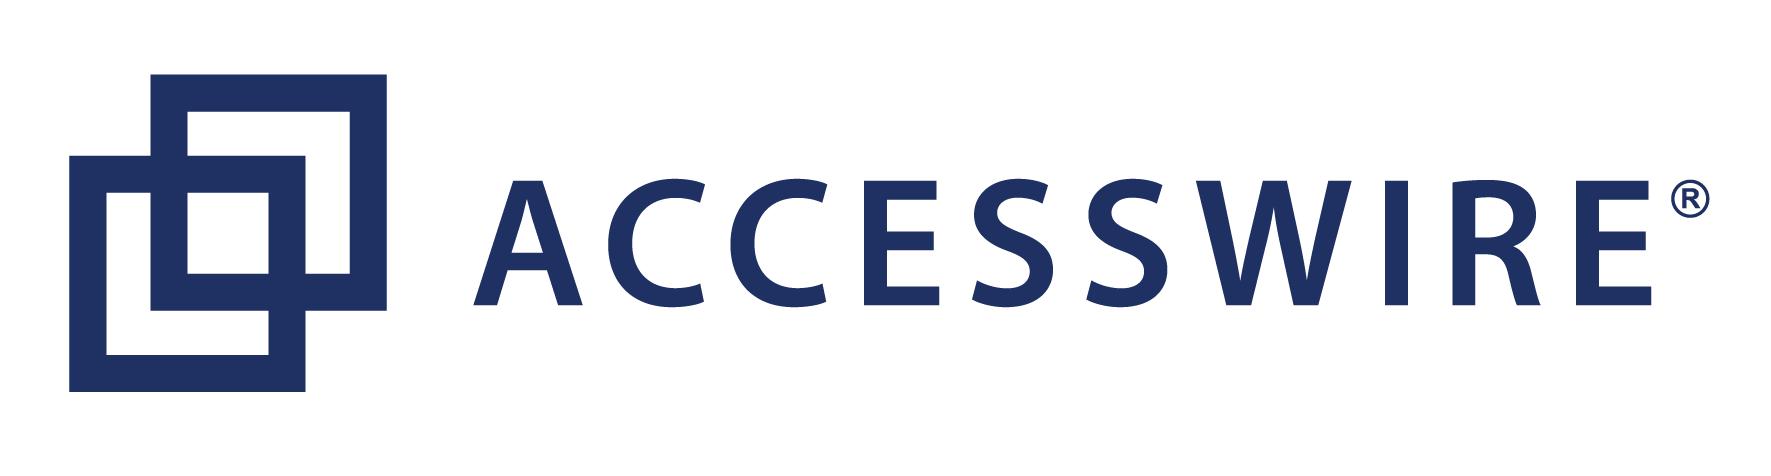 Accesswire